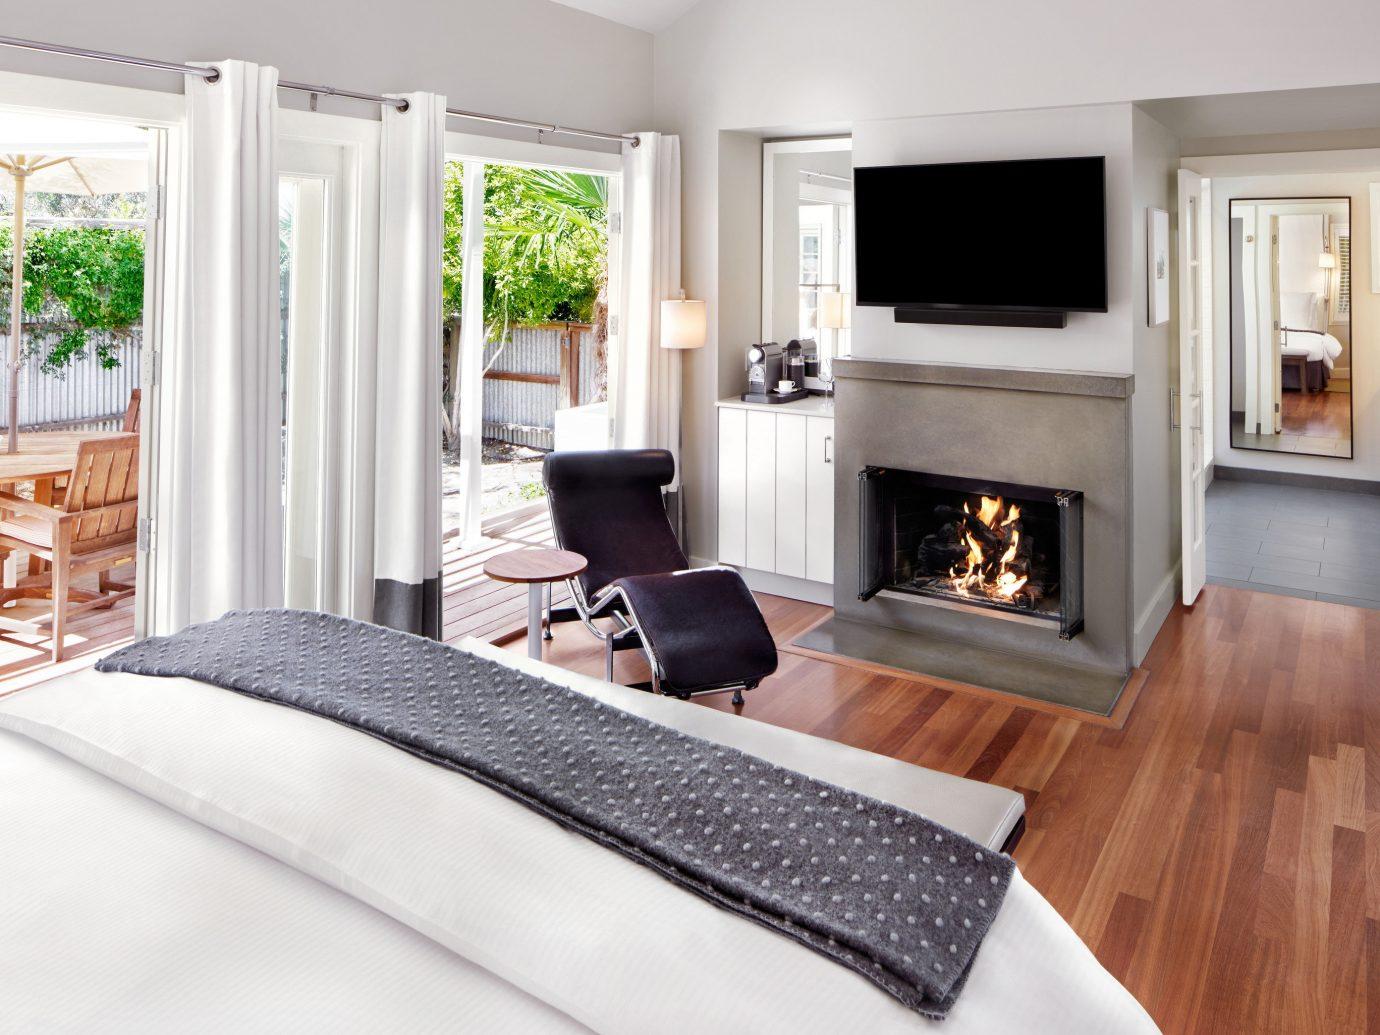 Bedroom at Carneros Resort and Spa